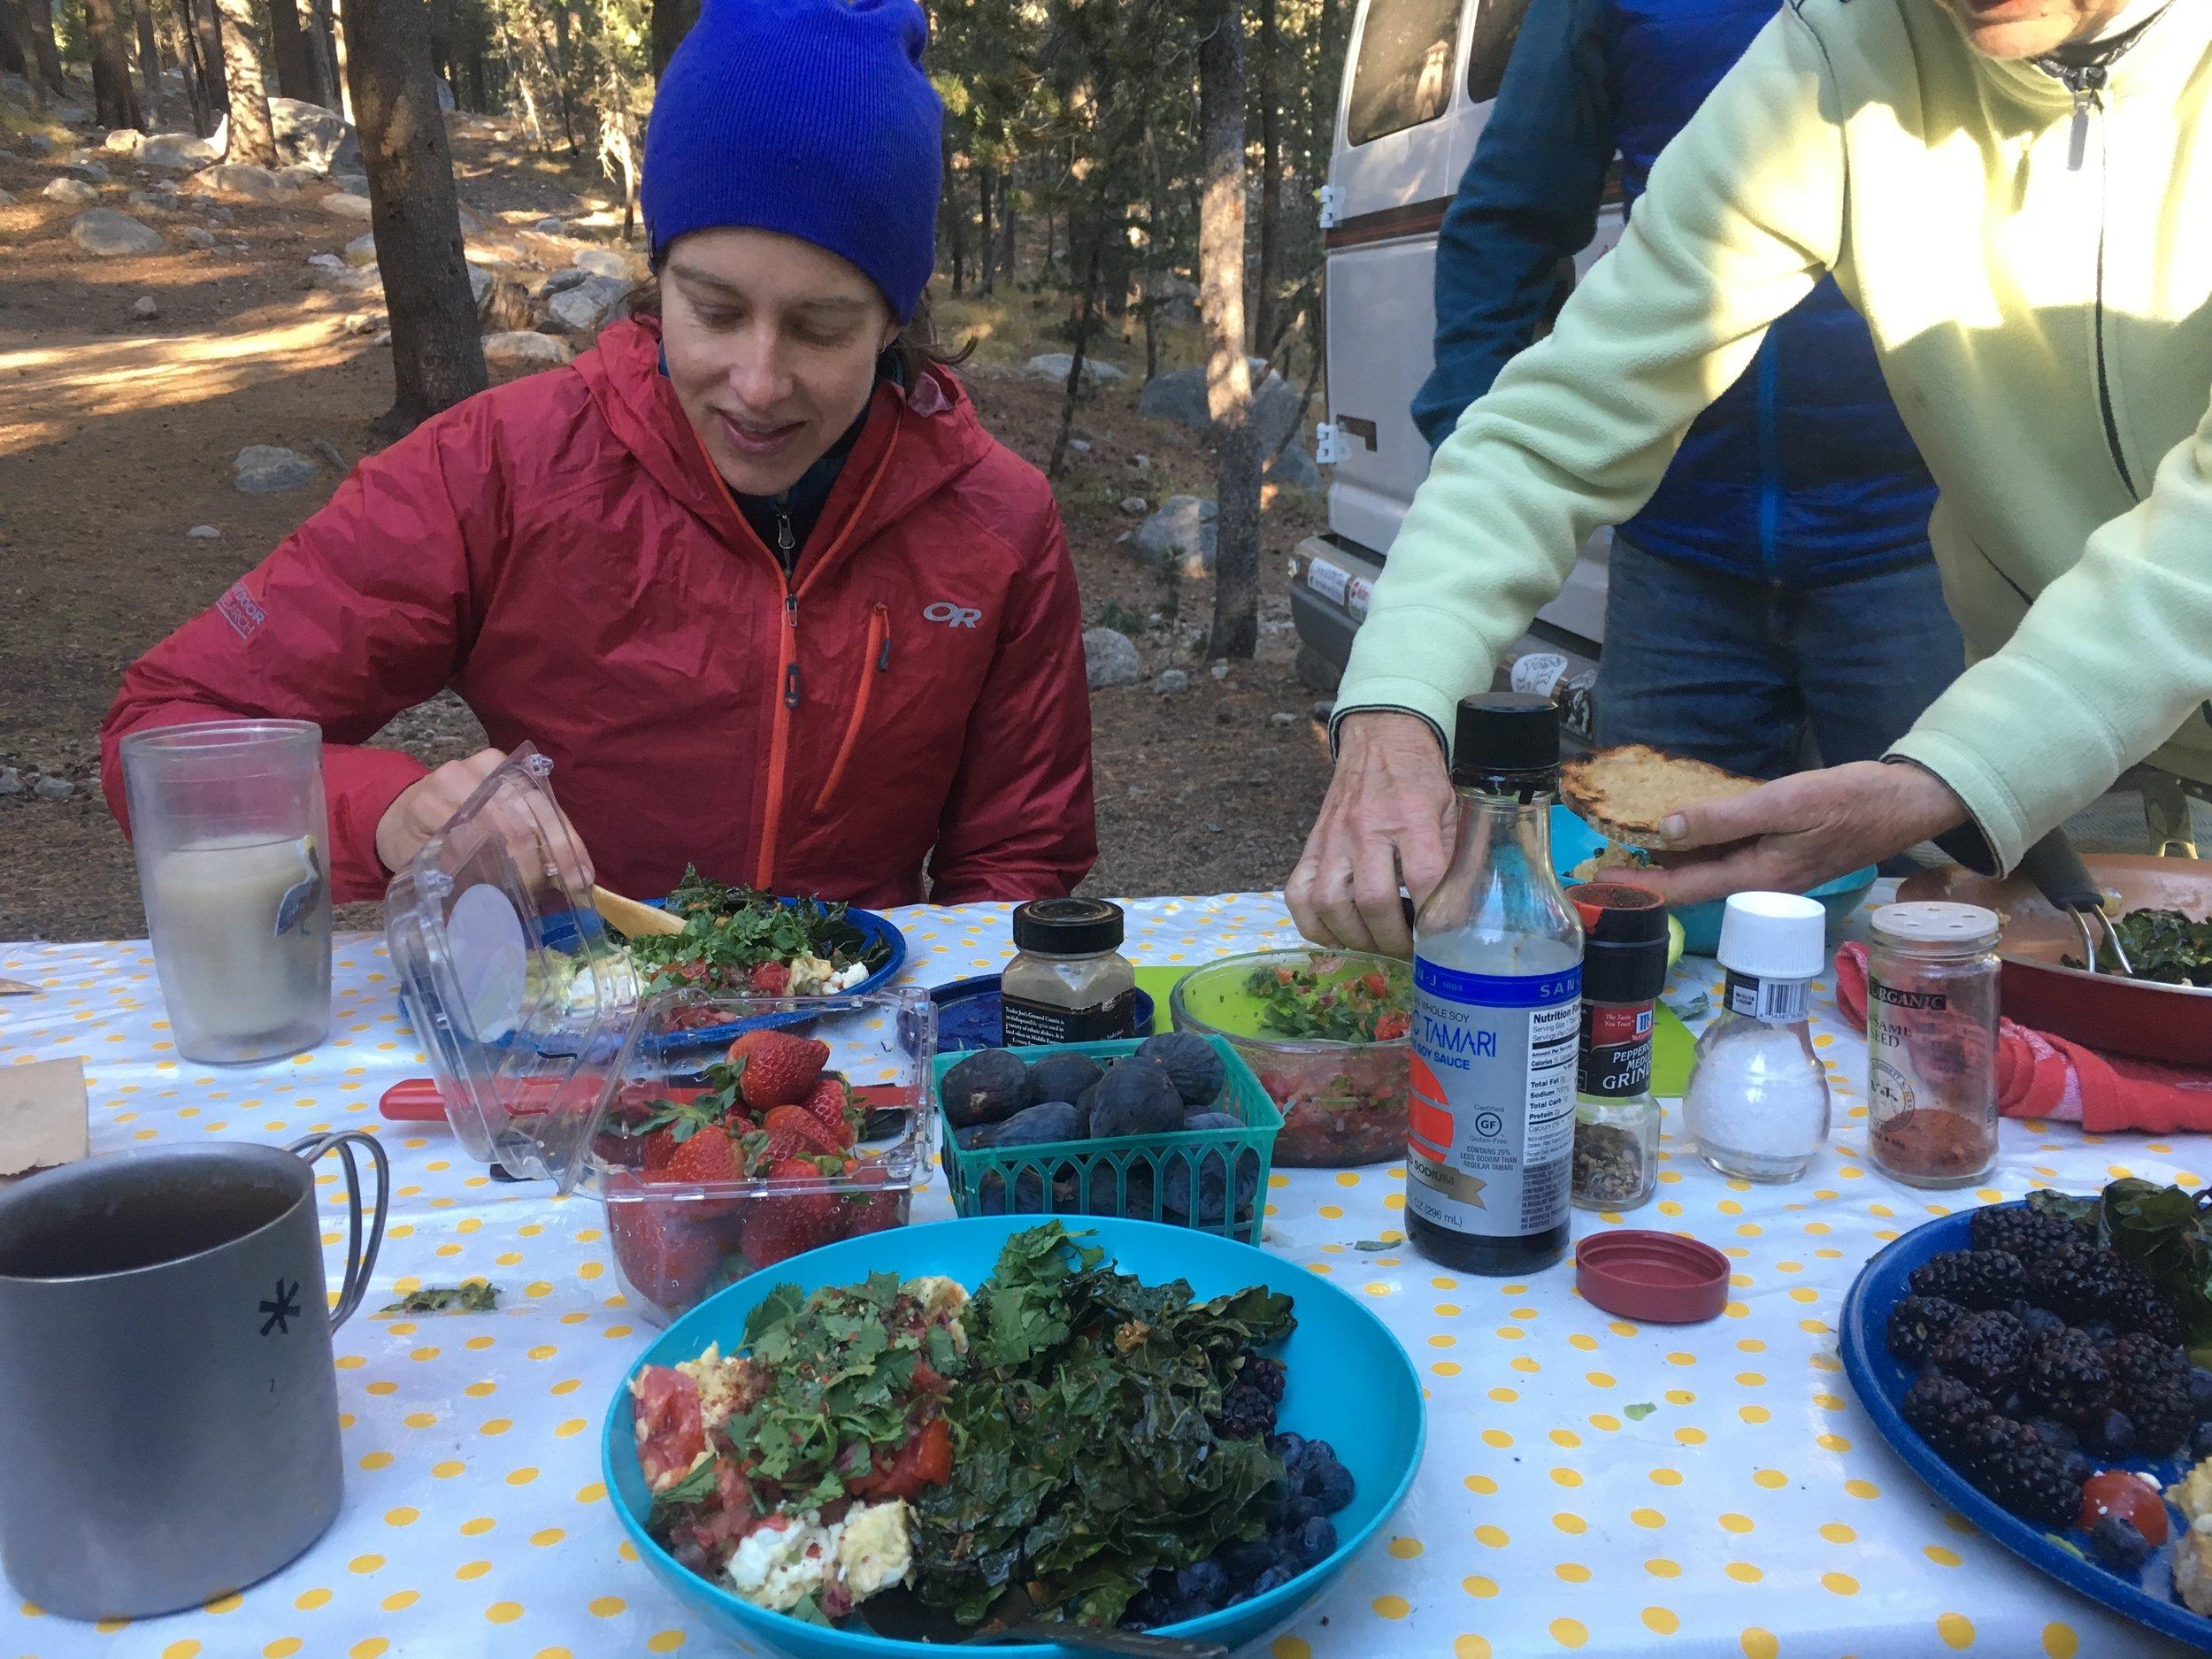 Brekkie feast at Chez Mobi (the name of Hillair and Michael's camper van).